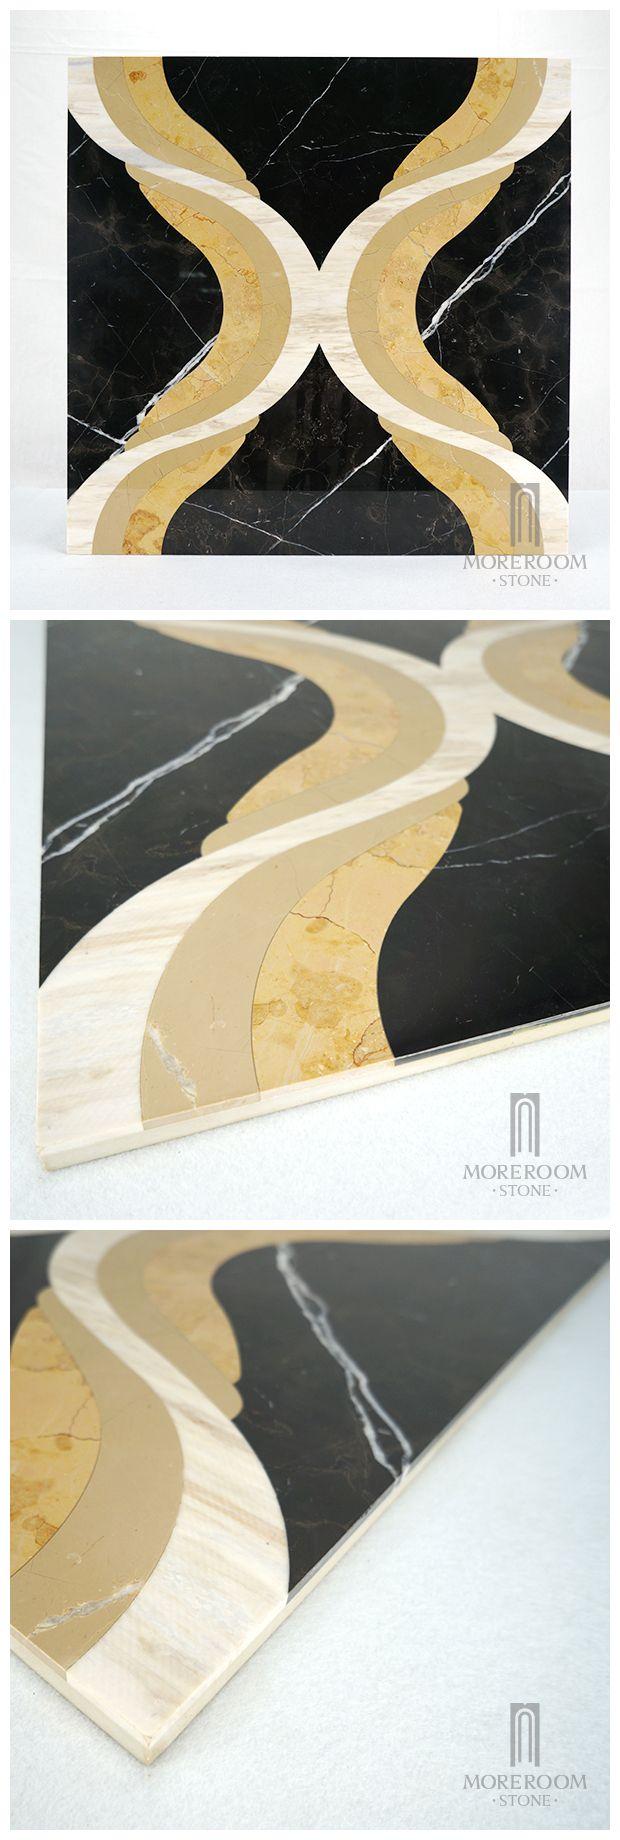 Spain Aulestia O Murélaga Nero Marquina Composite Marble Waterjet Marble Floor Tile Modern Bathroom Design Spanish Marble Price, Nero Marquina Marble Medallion